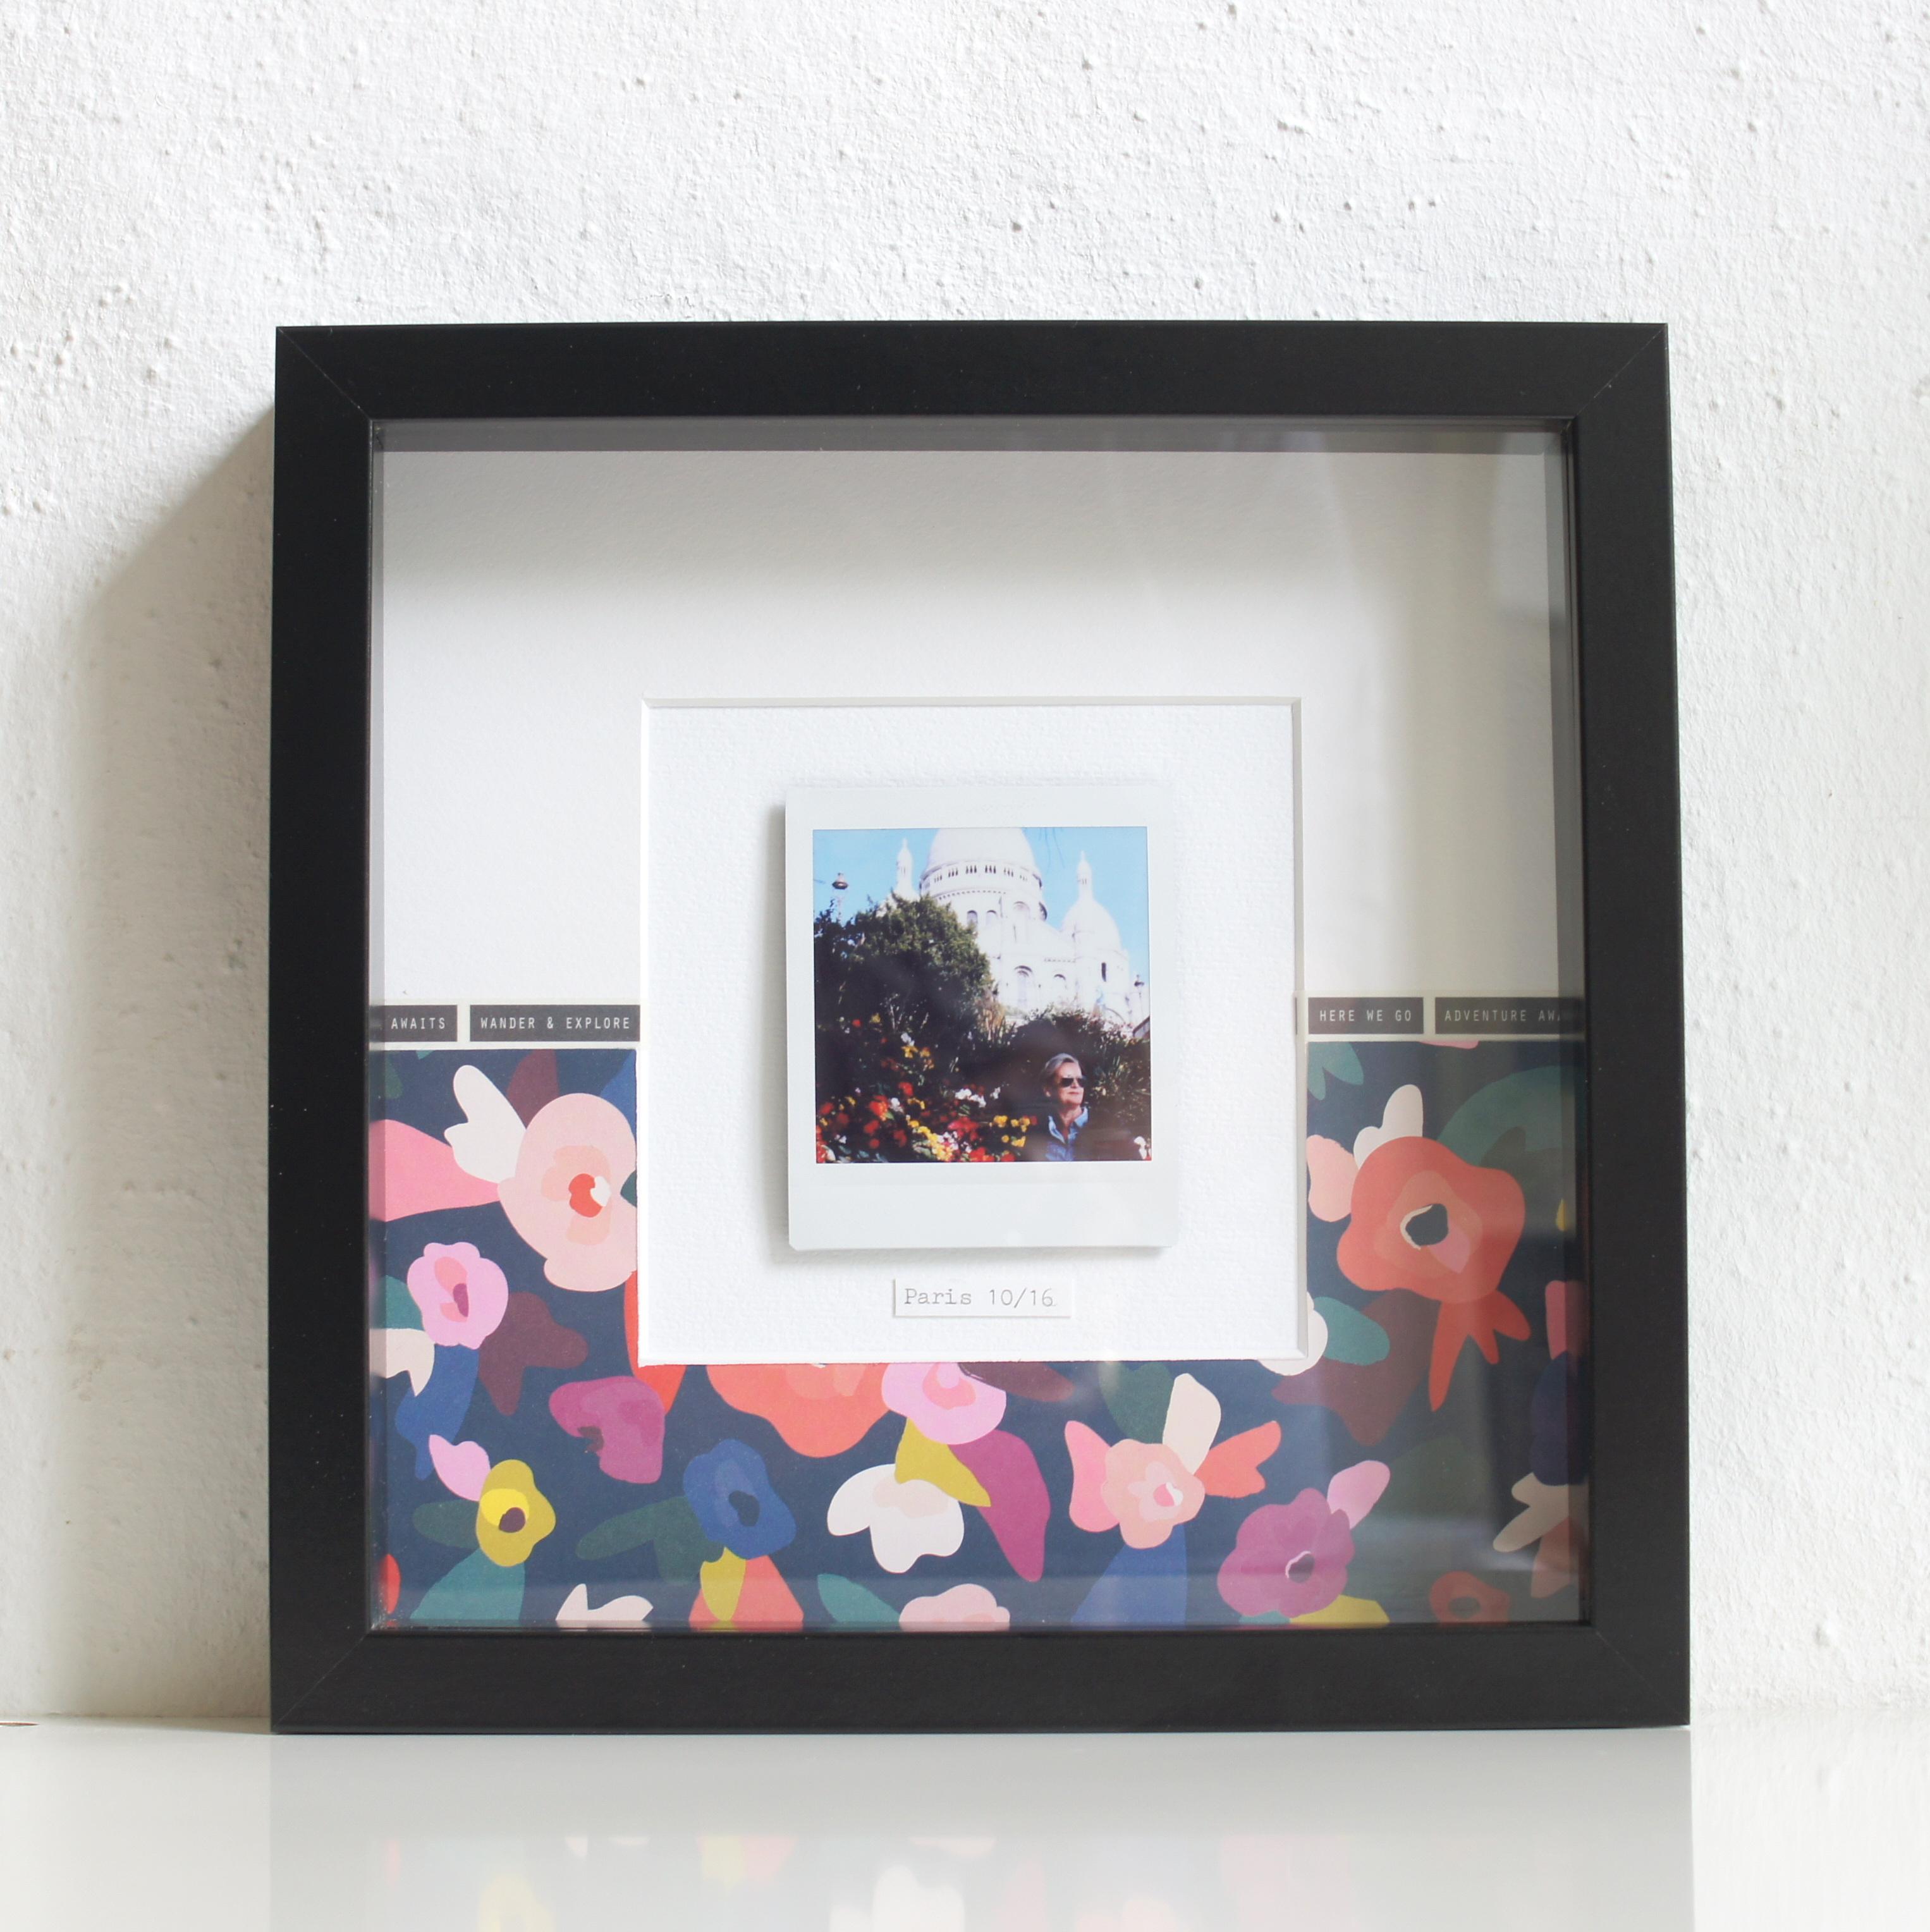 DYI | Fuji Instax Square Foto und Ikea Ribba Rahmen, die perfekte ...